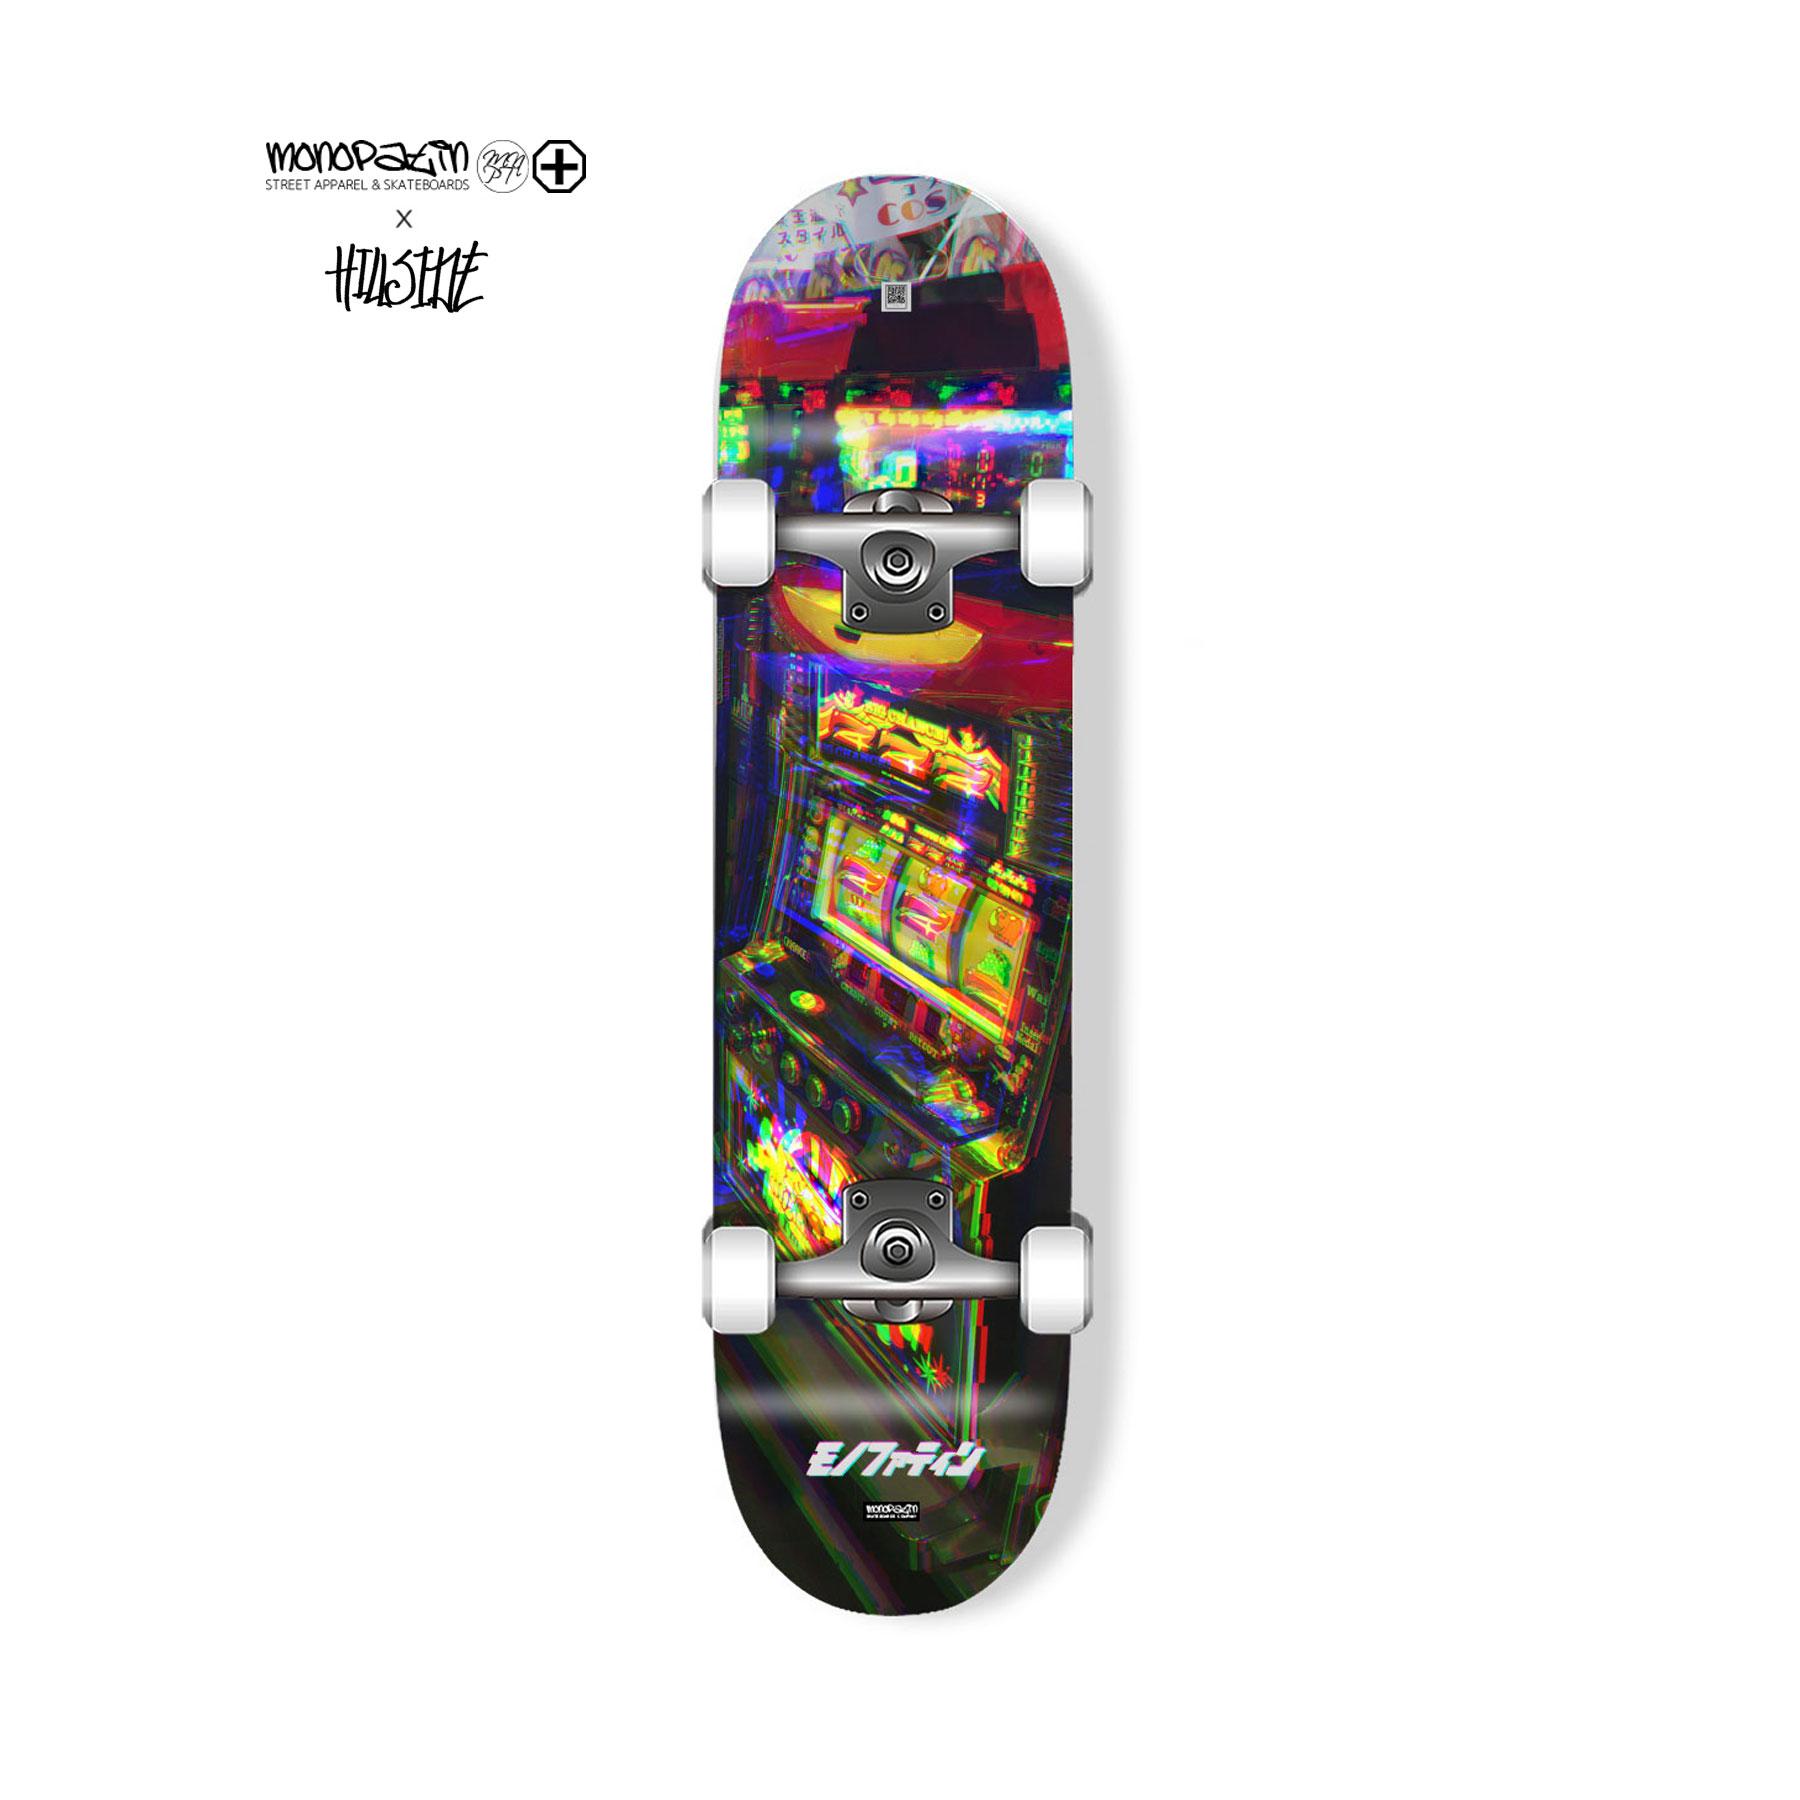 monopatin x hillside collaboration slot machine 컴플릿 스케이트보드